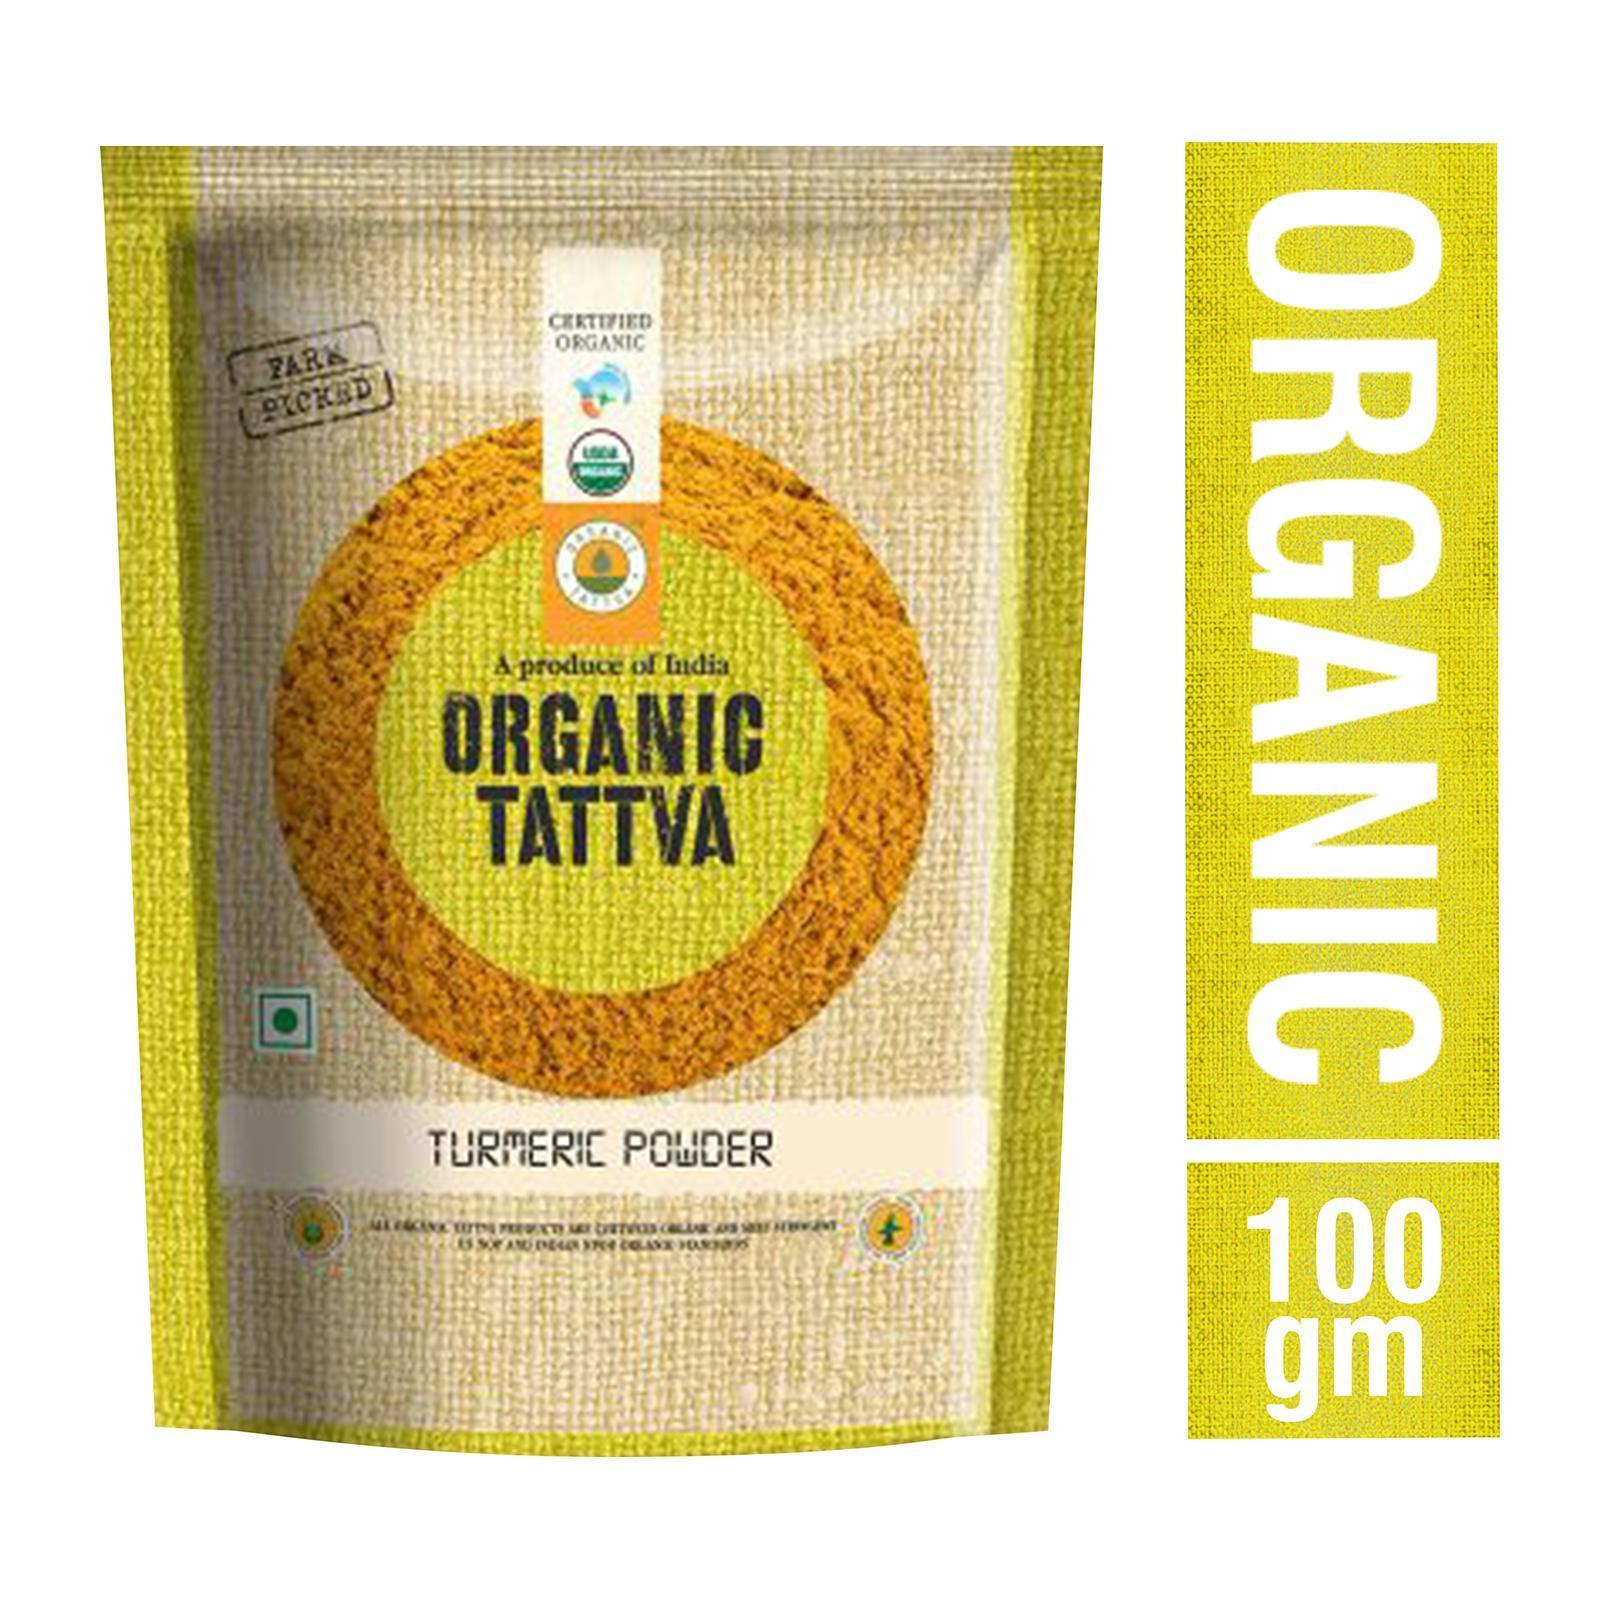 Organic Tattva Organic Turmeric Powder - By Sonnamera